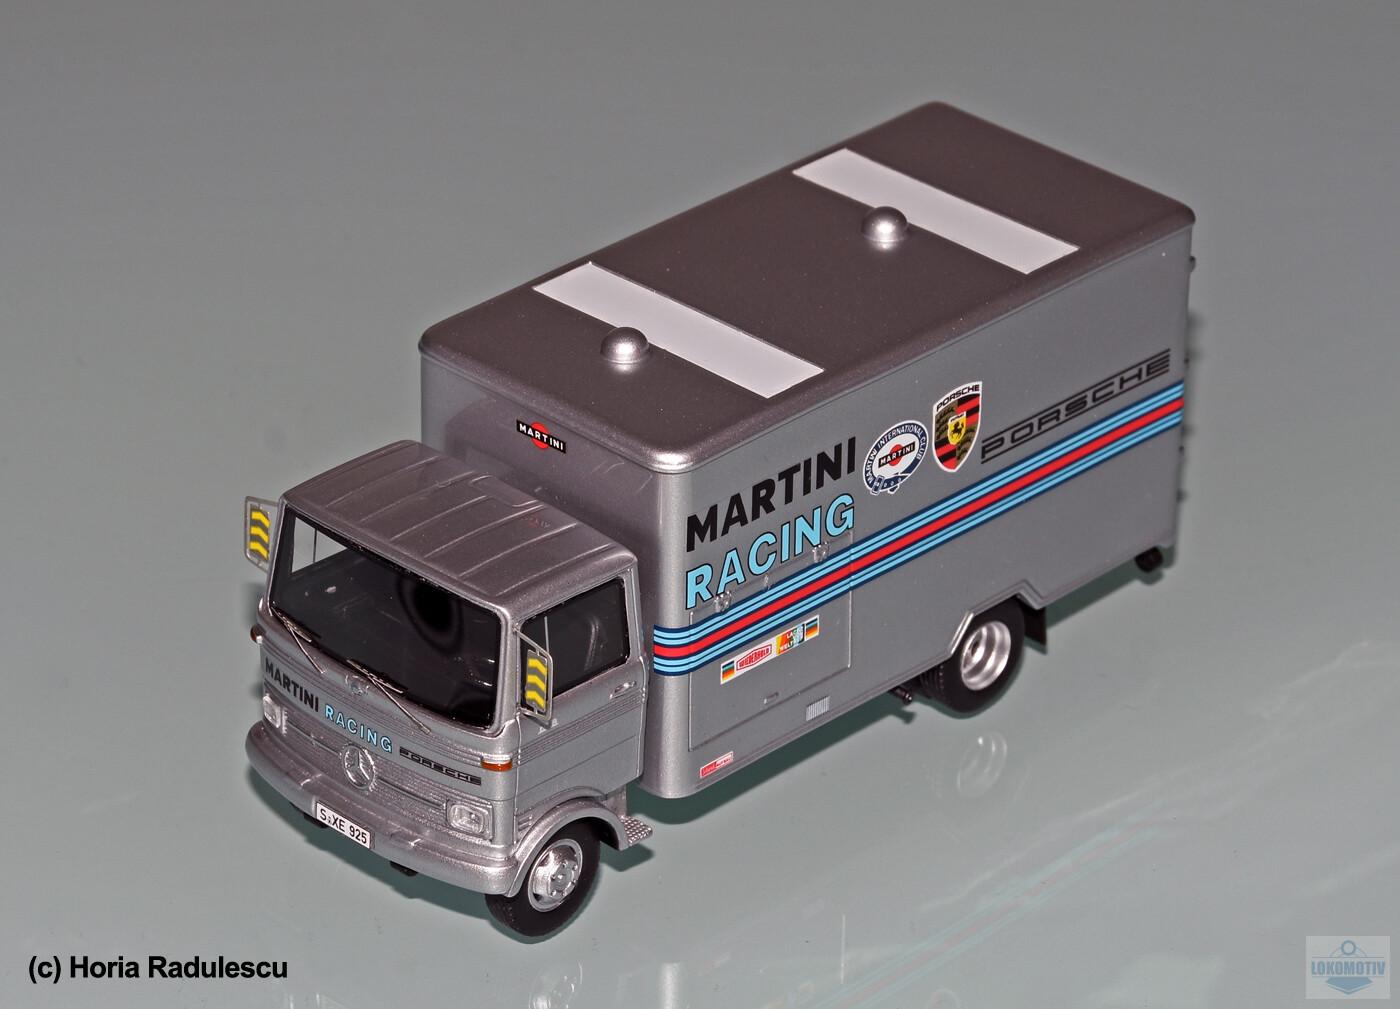 64-Martini-Racing-MB-LP-608-ScaleMini-1302de136d457ab20.jpg